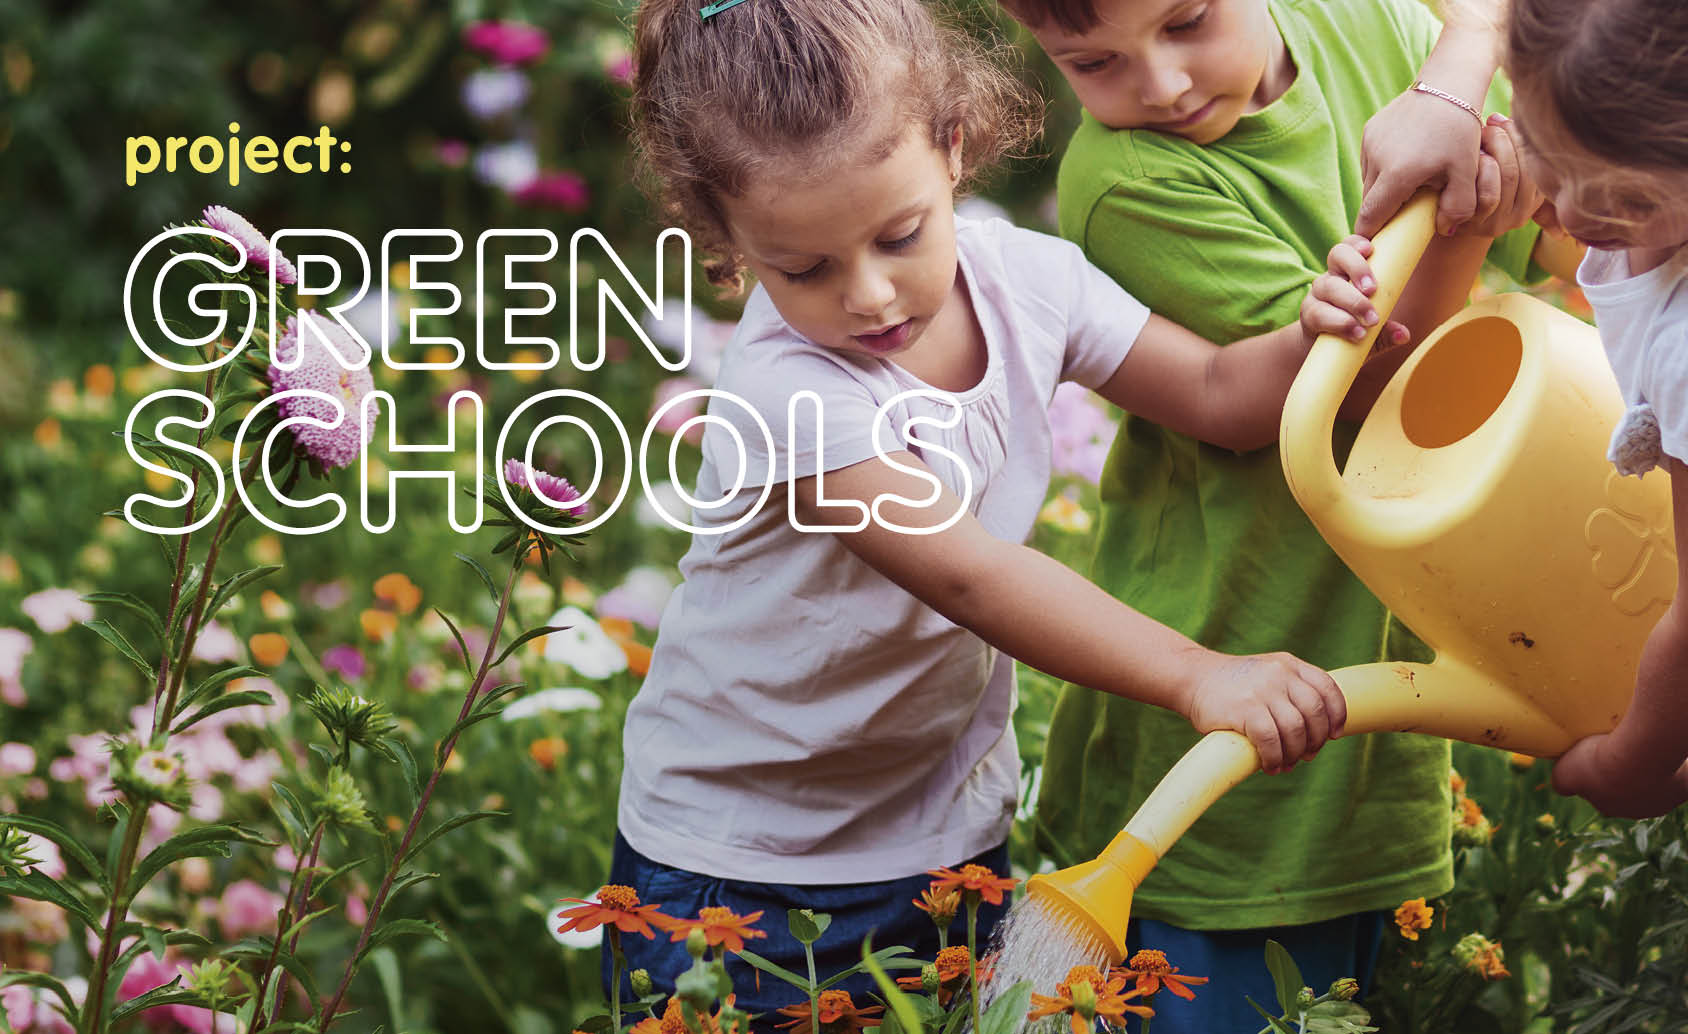 CH4976_Charter Hall_Currimundi_Shop for Schools_Web Tiles_844x517px